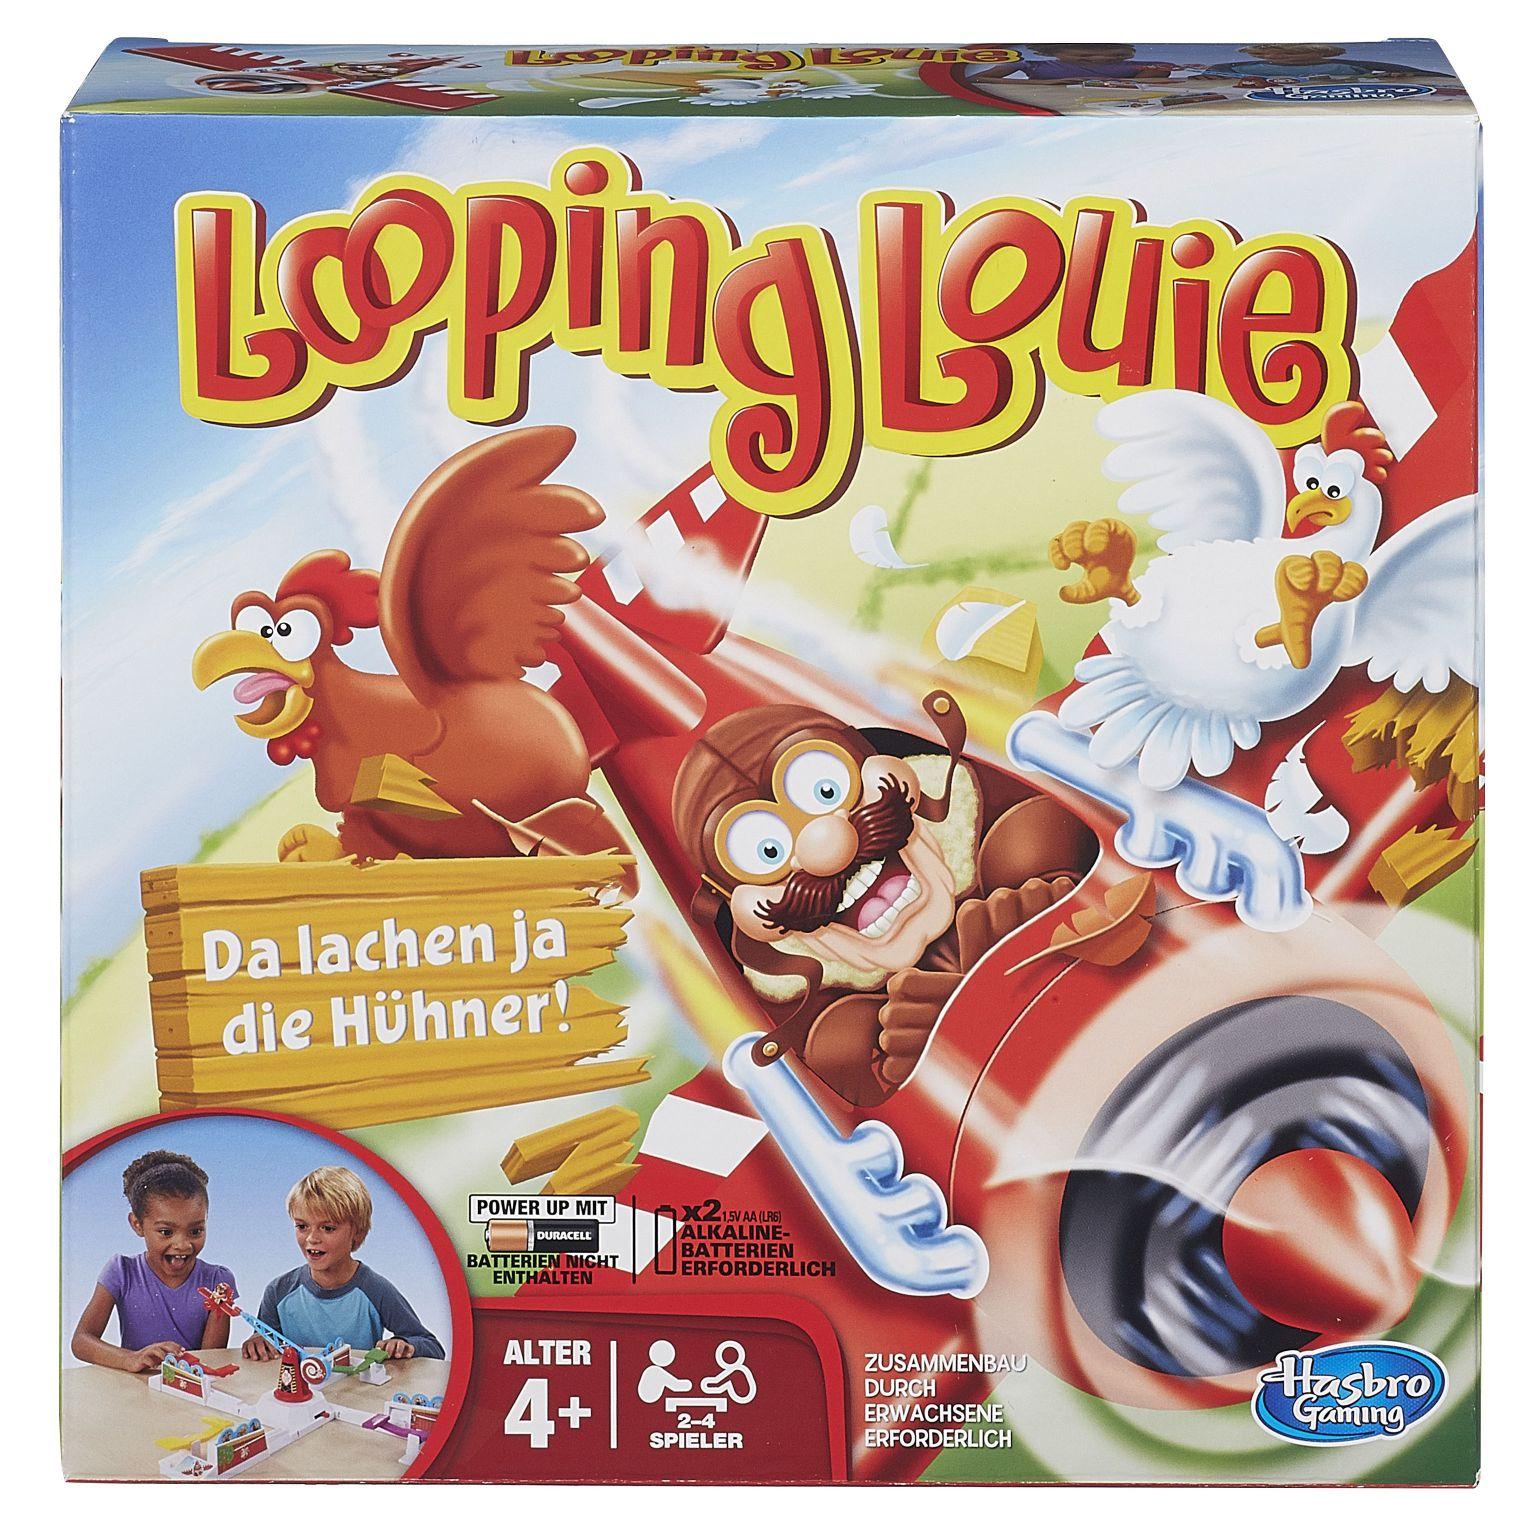 Image of Hasbro 15692398 - Looping Louie - Neuauflage